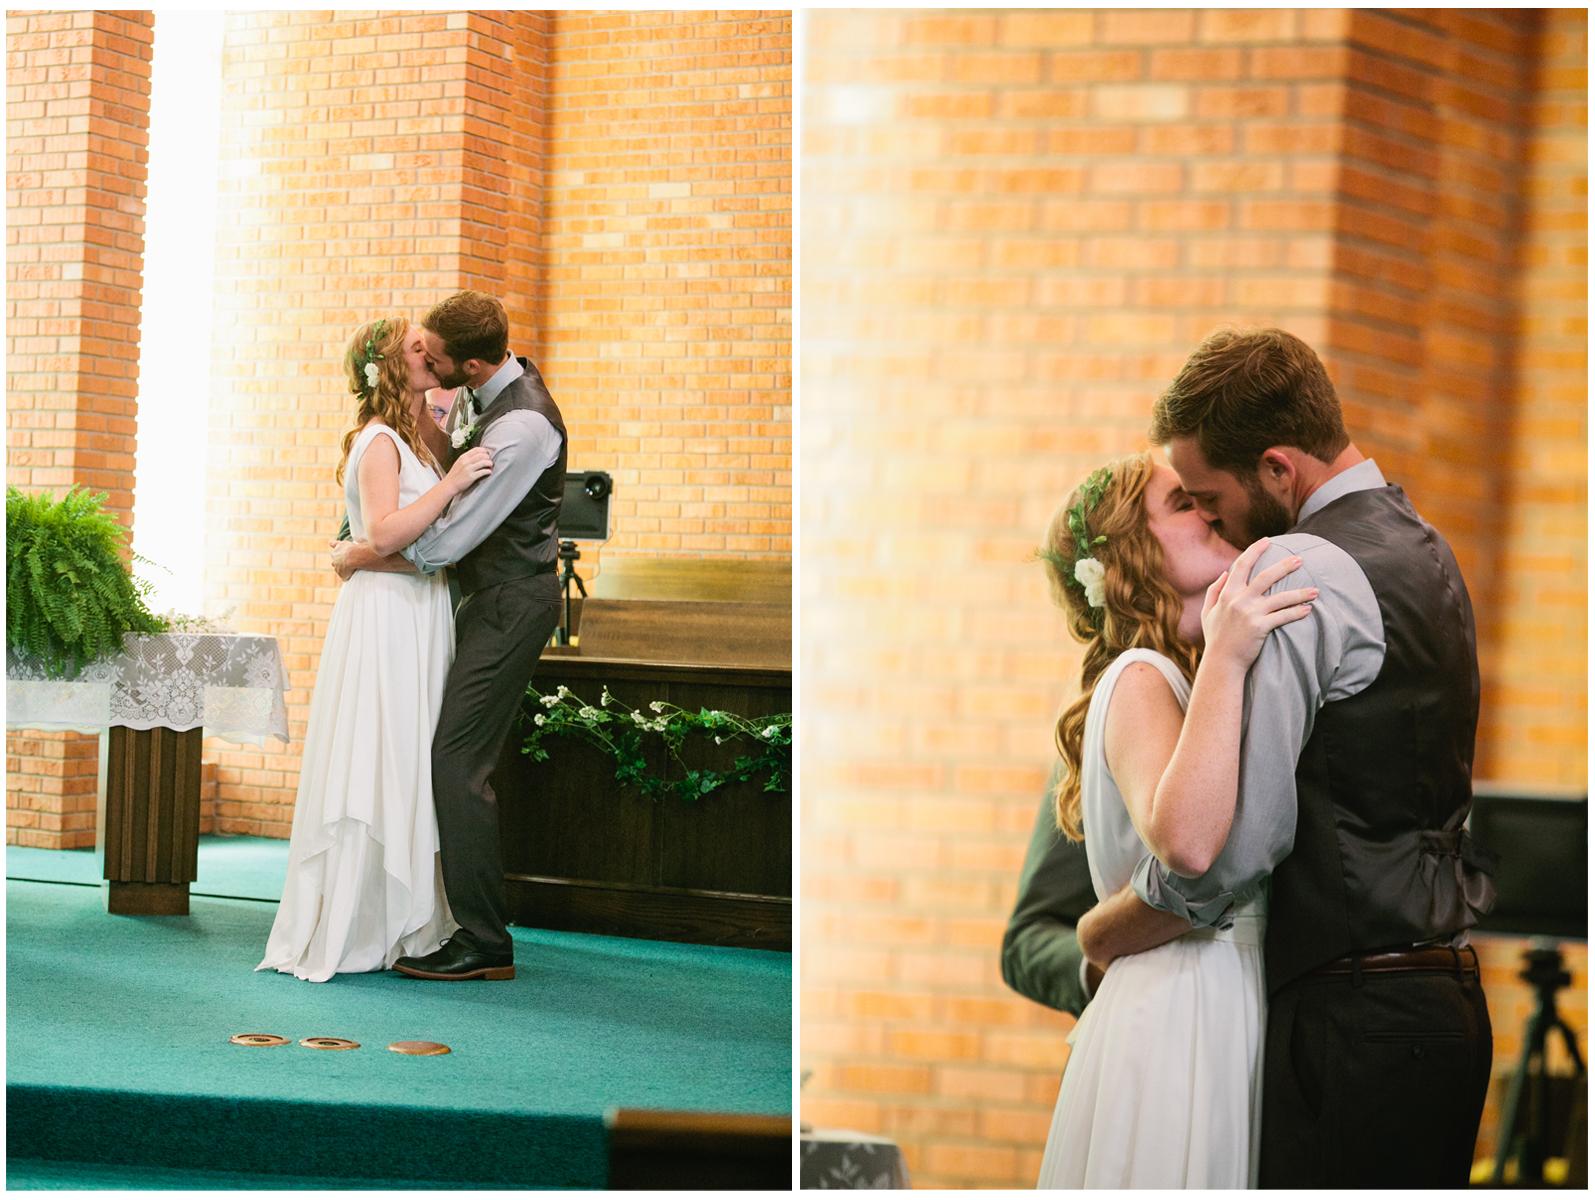 ames_wedding_photos06.jpg